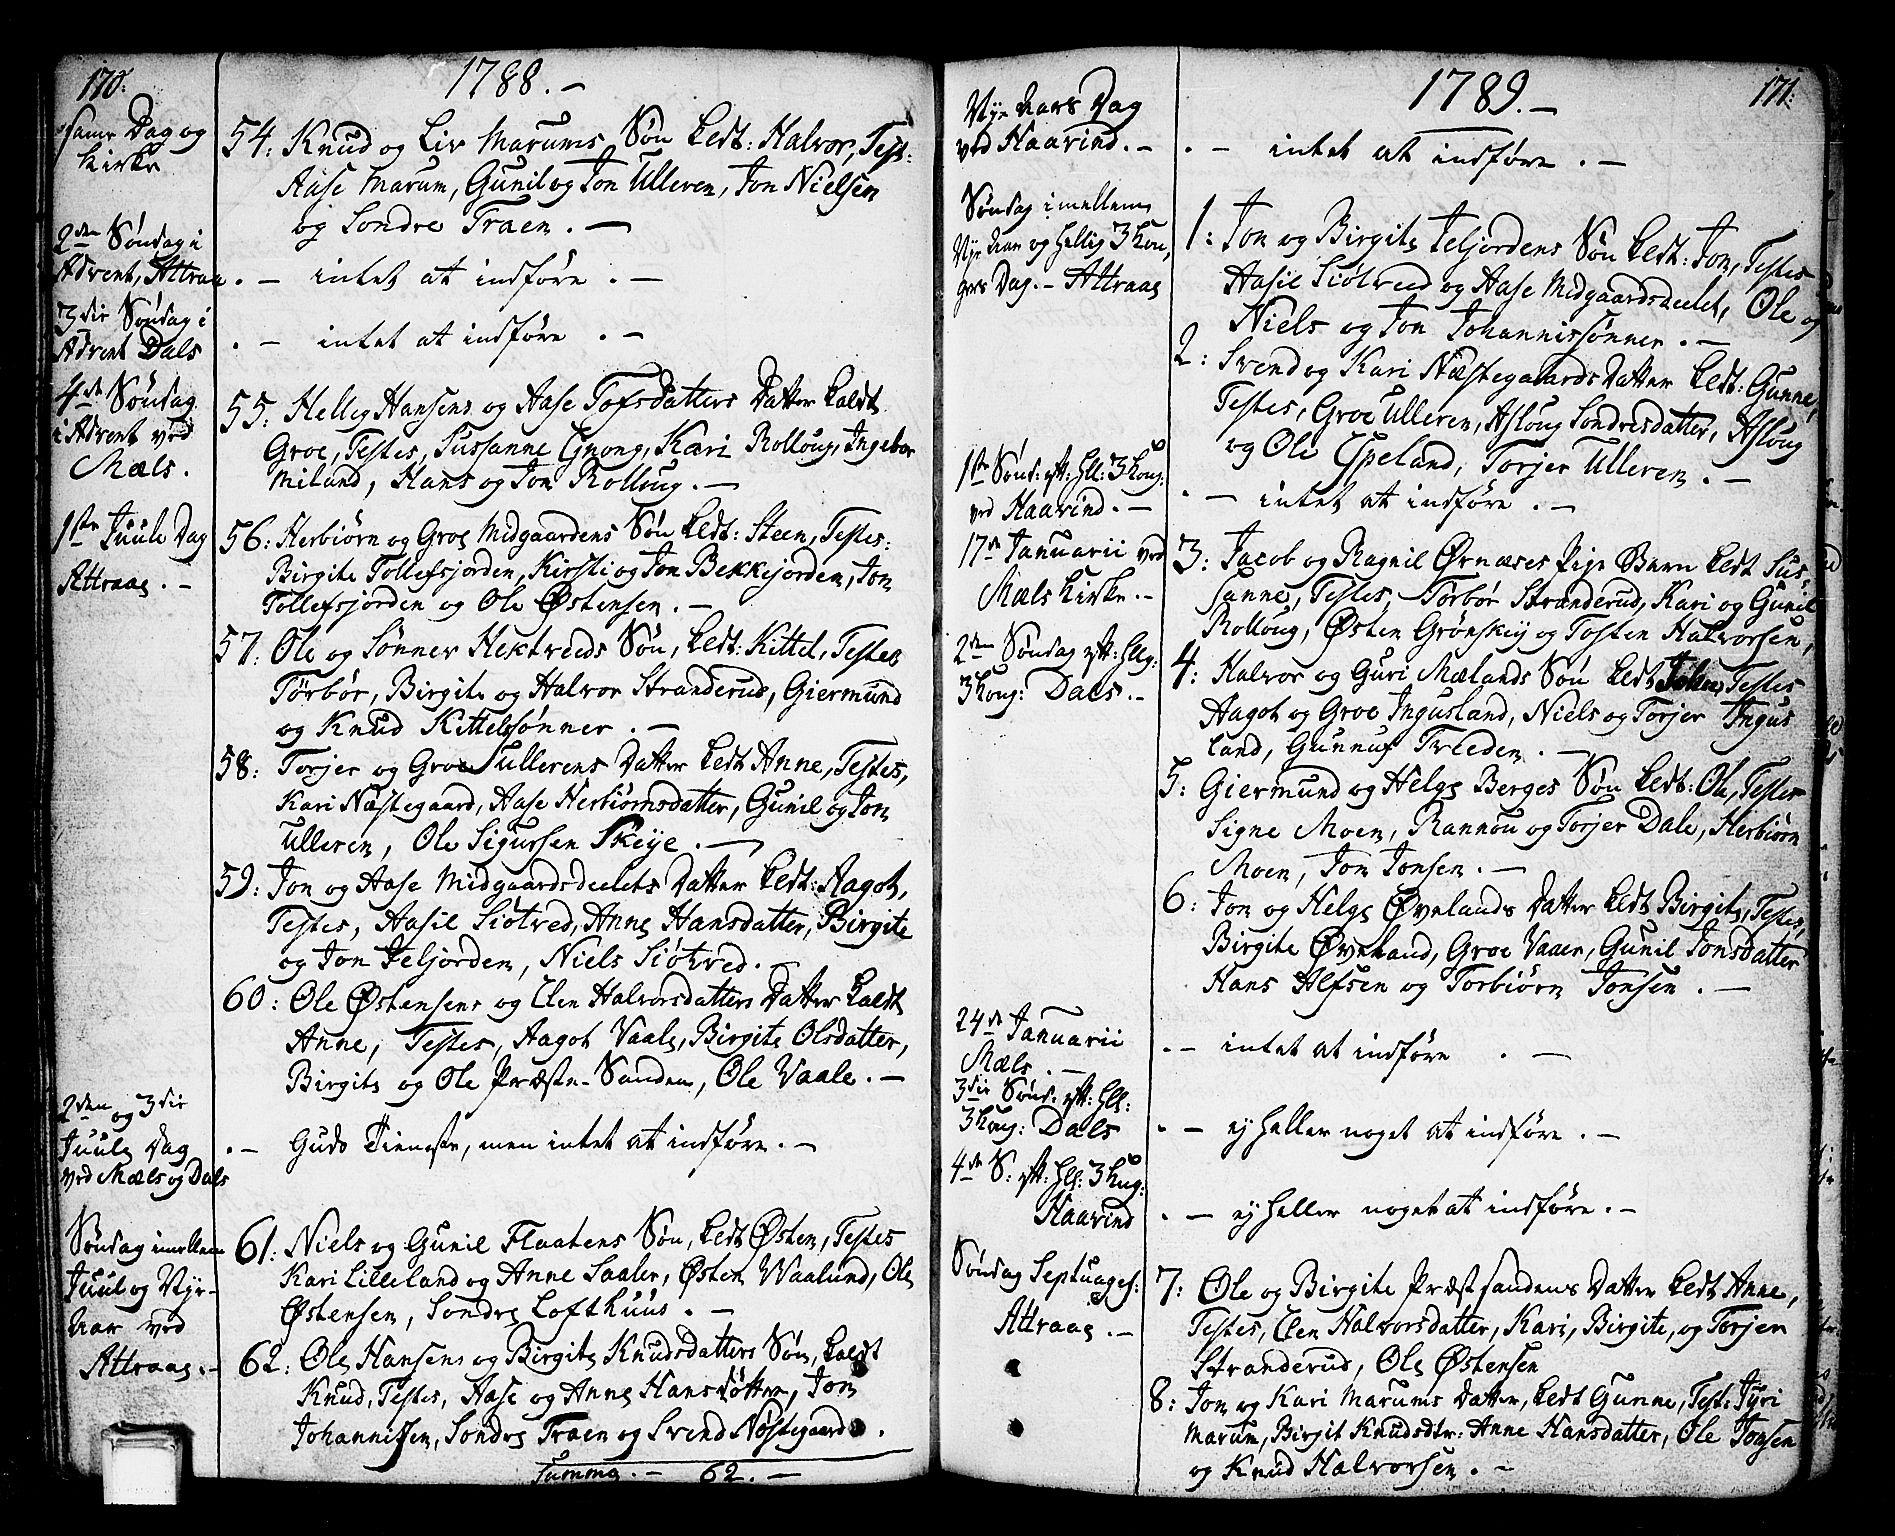 SAKO, Tinn kirkebøker, F/Fa/L0002: Ministerialbok nr. I 2, 1757-1810, s. 170-171